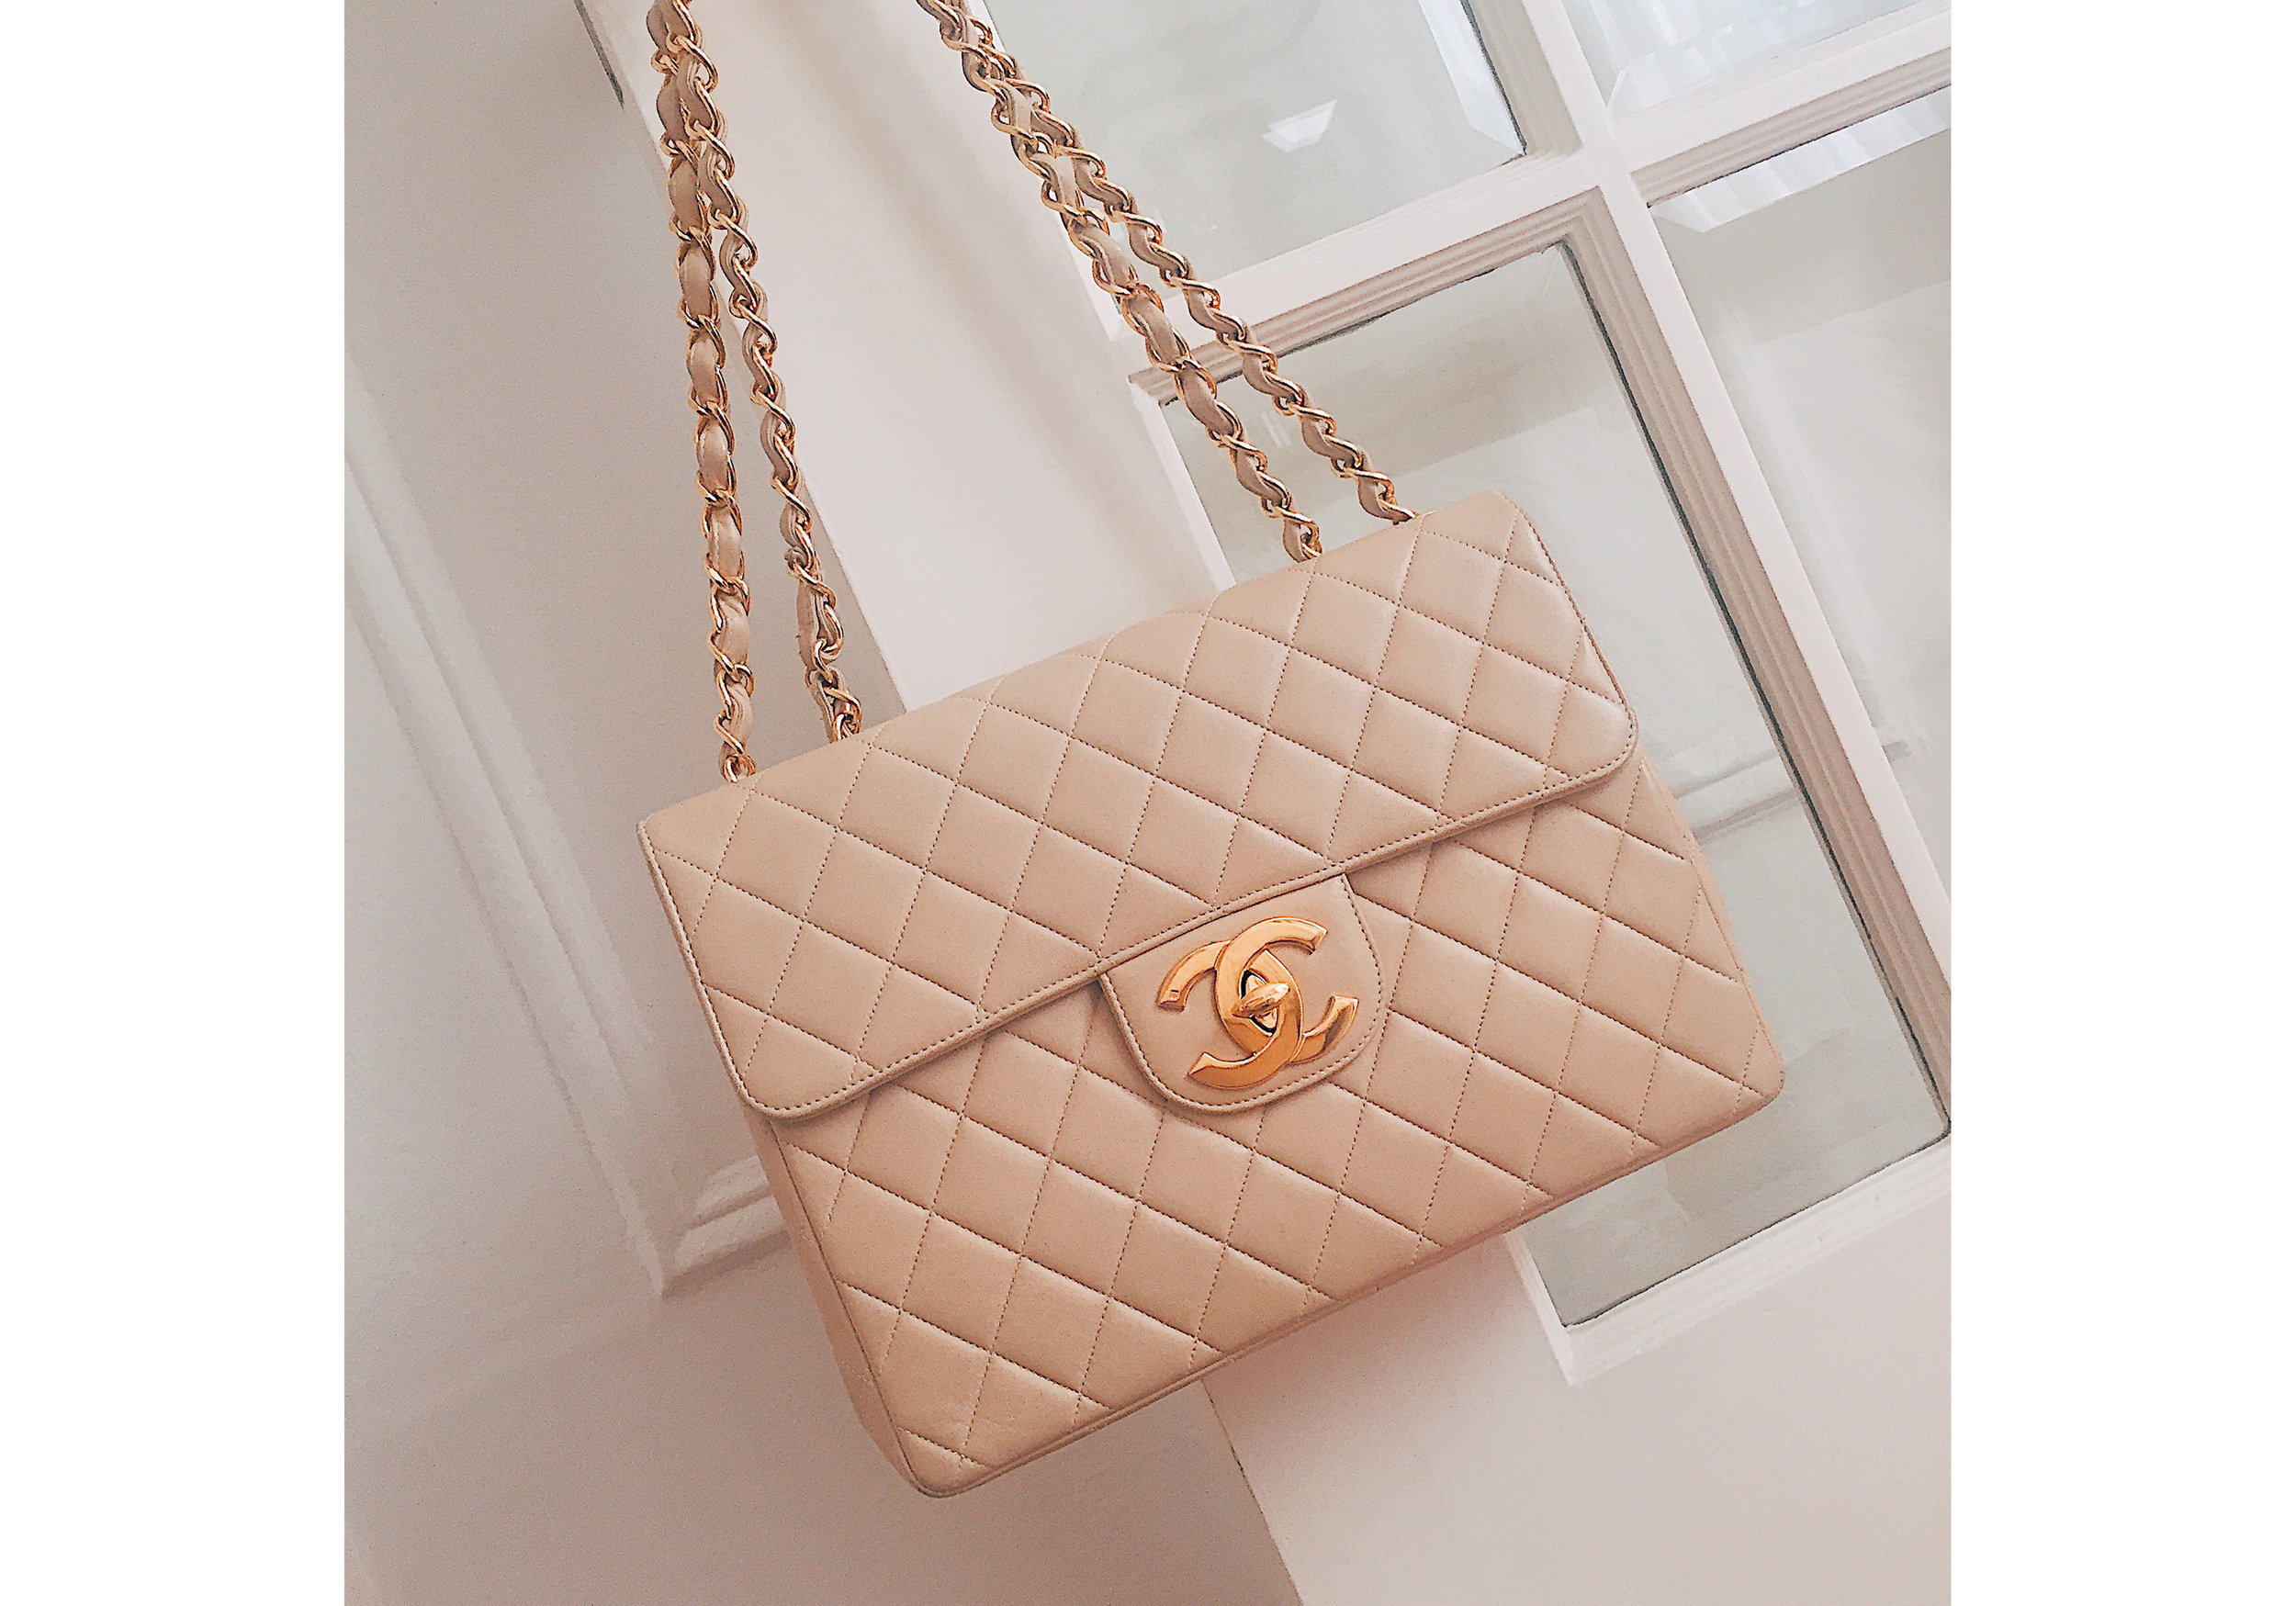 Vintage Nude Chanel Jumbo Bag.jpg